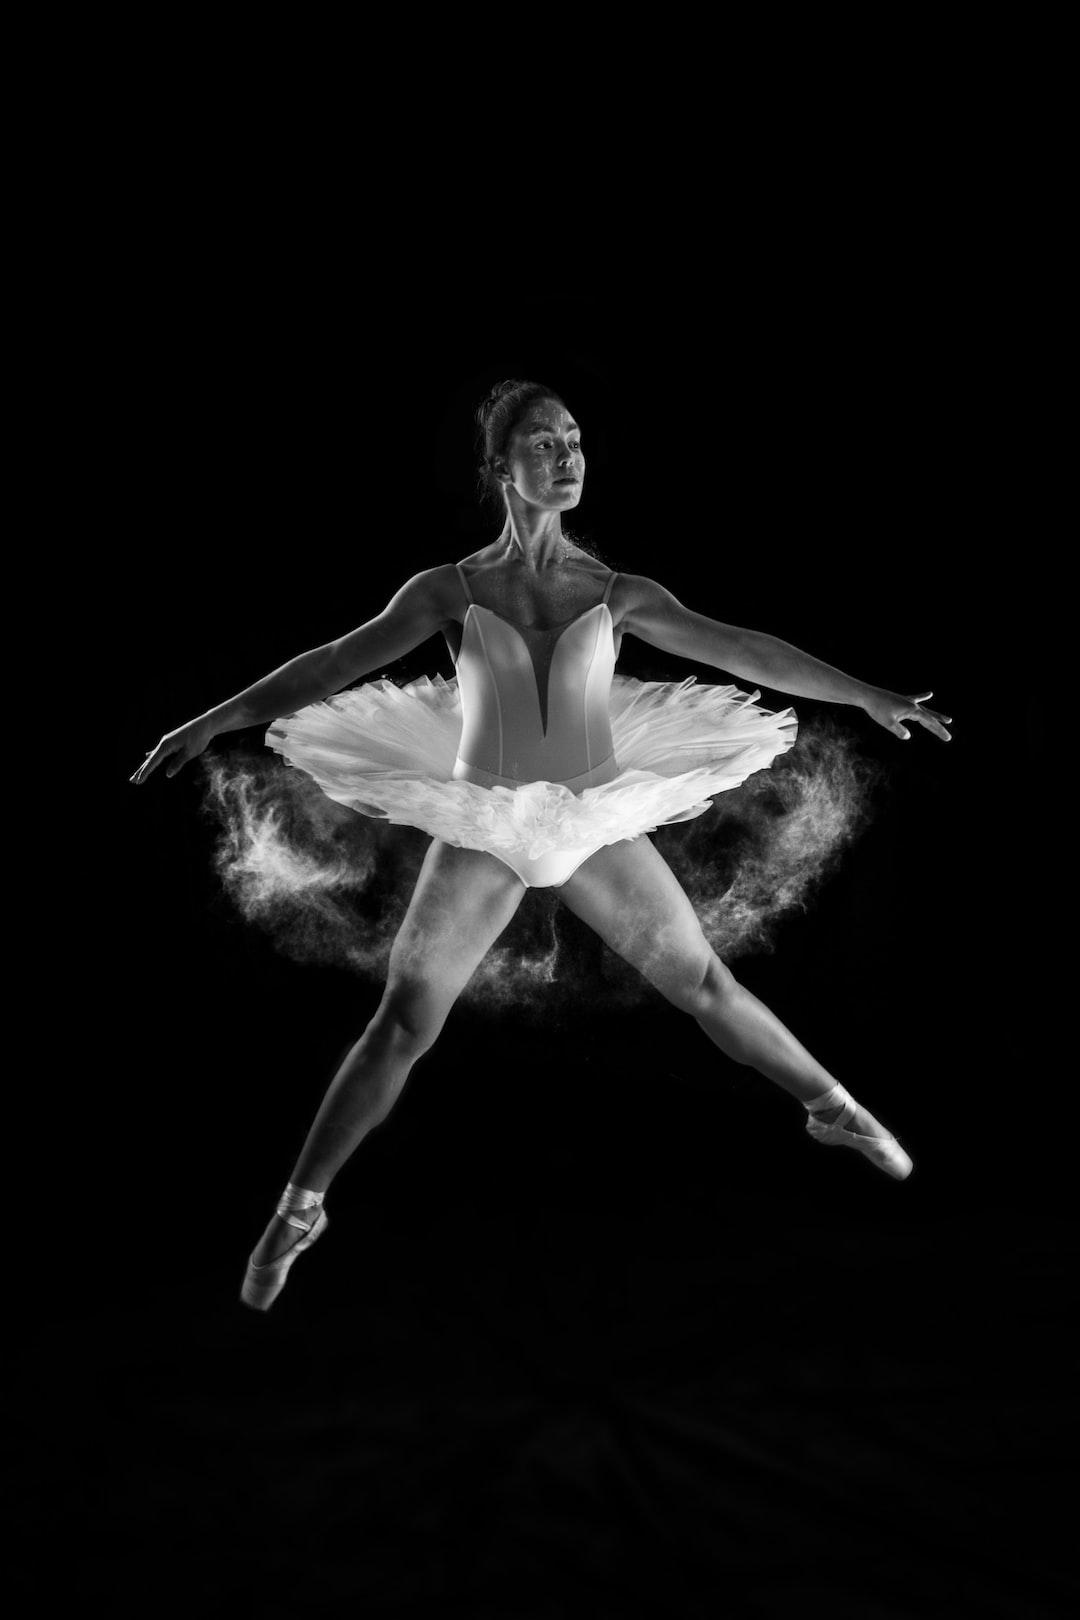 ballet dancer in Matosinhos